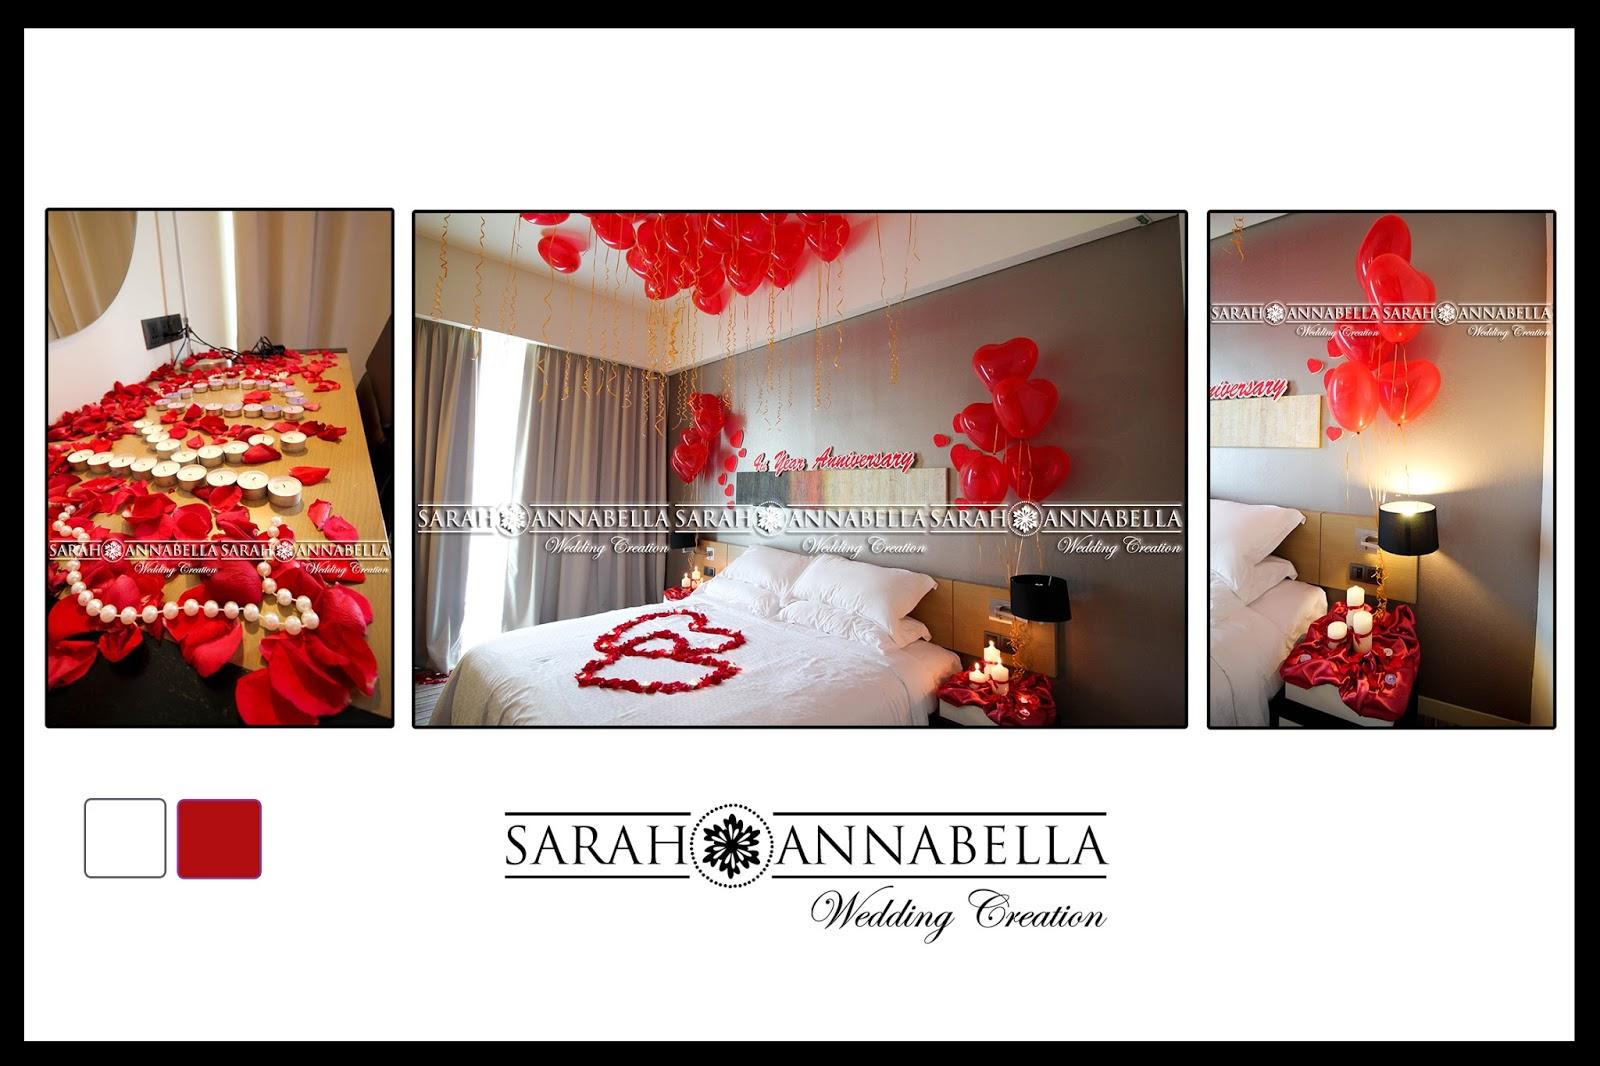 5 year anniversary decorations